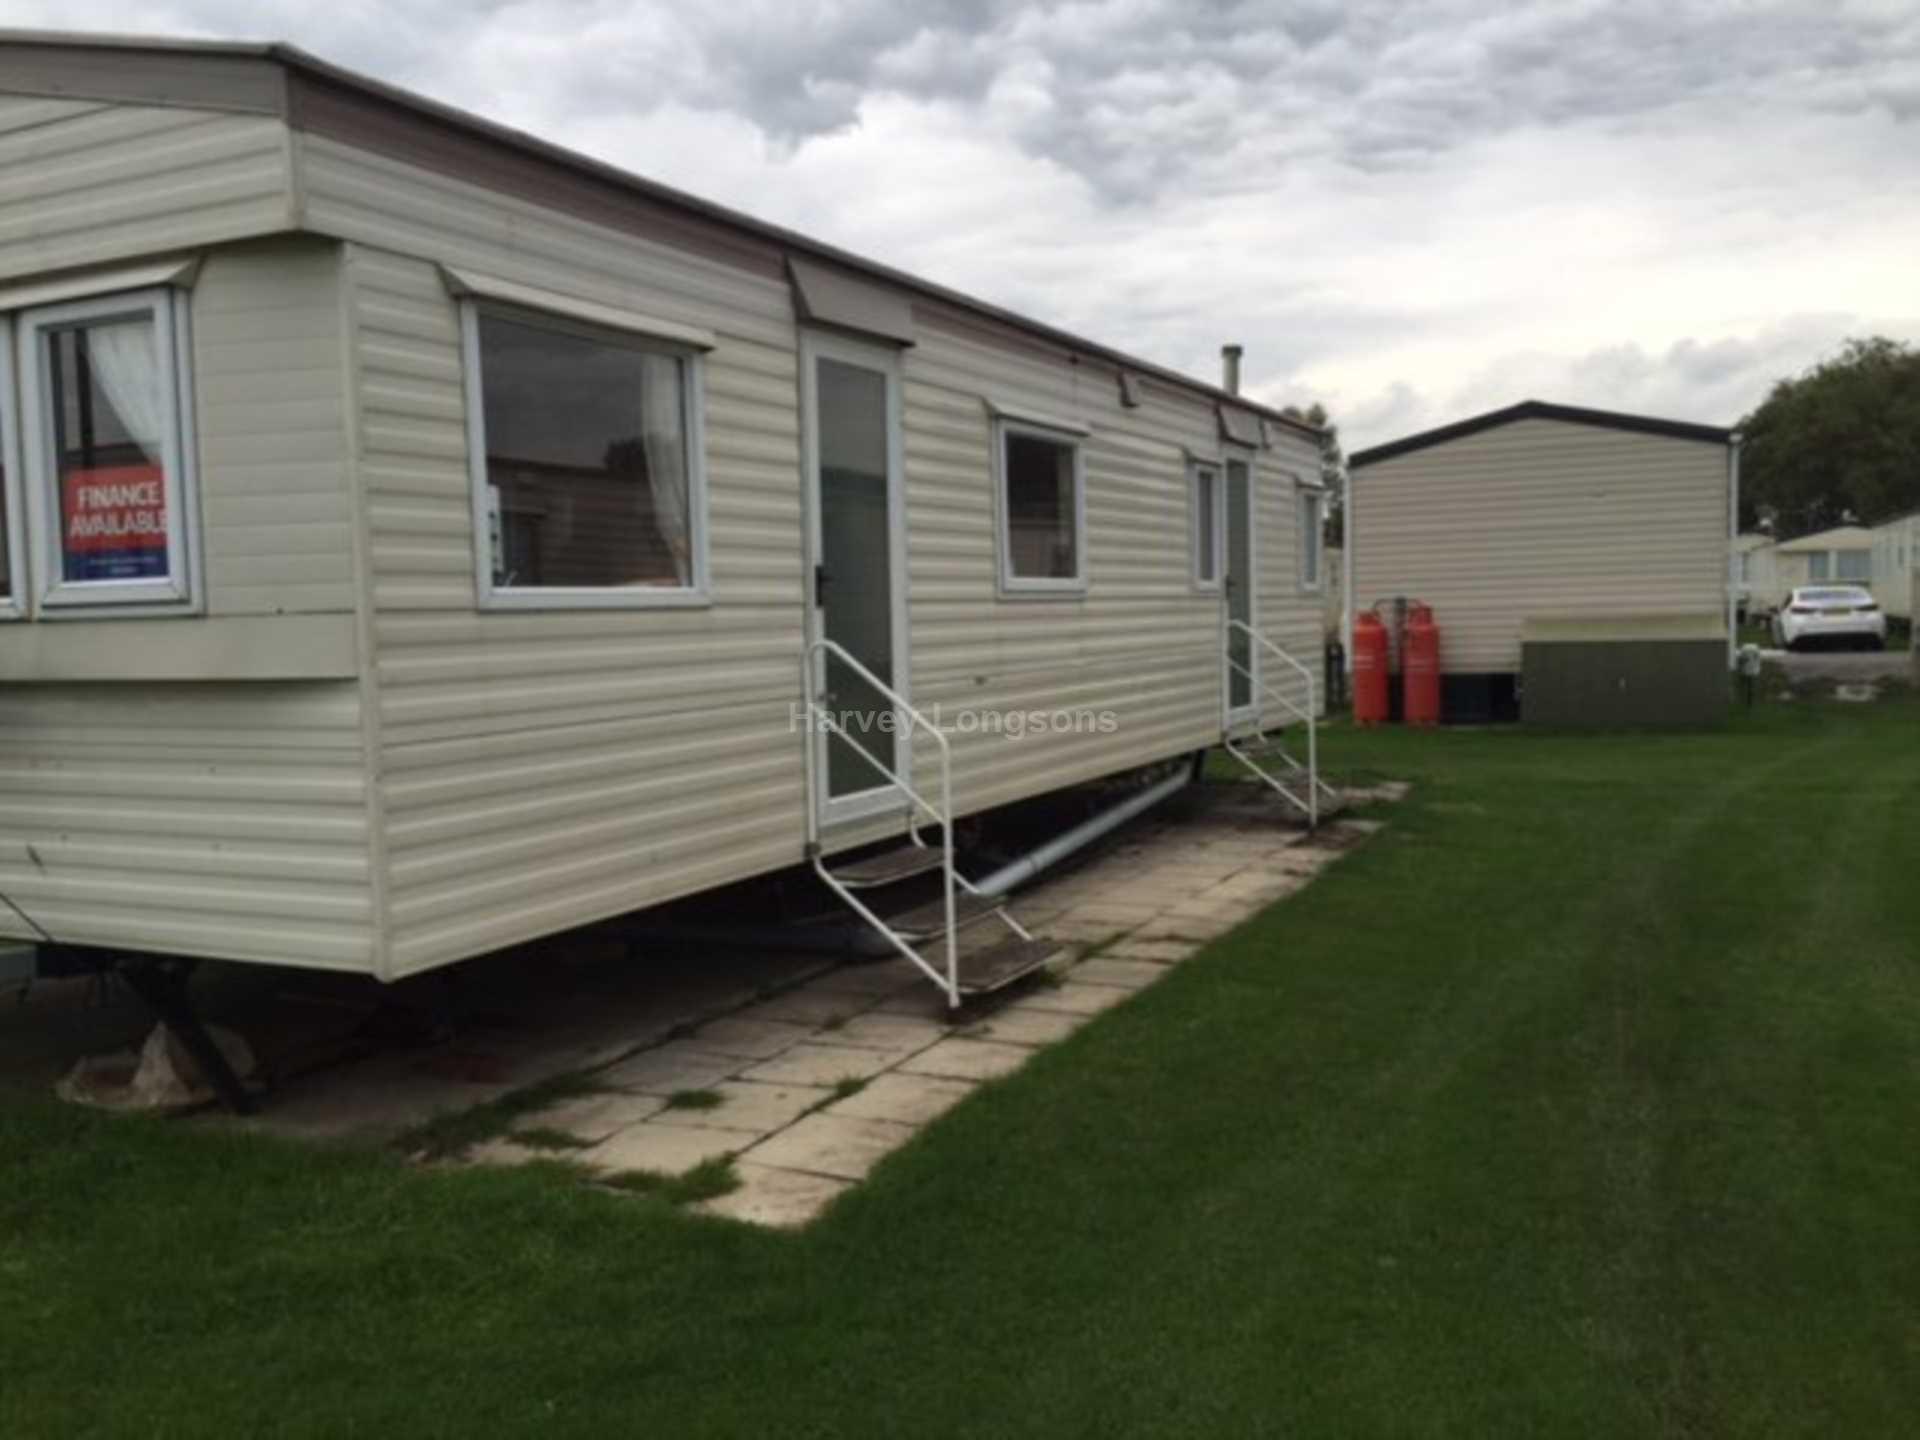 Unique Static Caravan Hastings Sussex 2 Bedrooms 6 Berth Pemberton